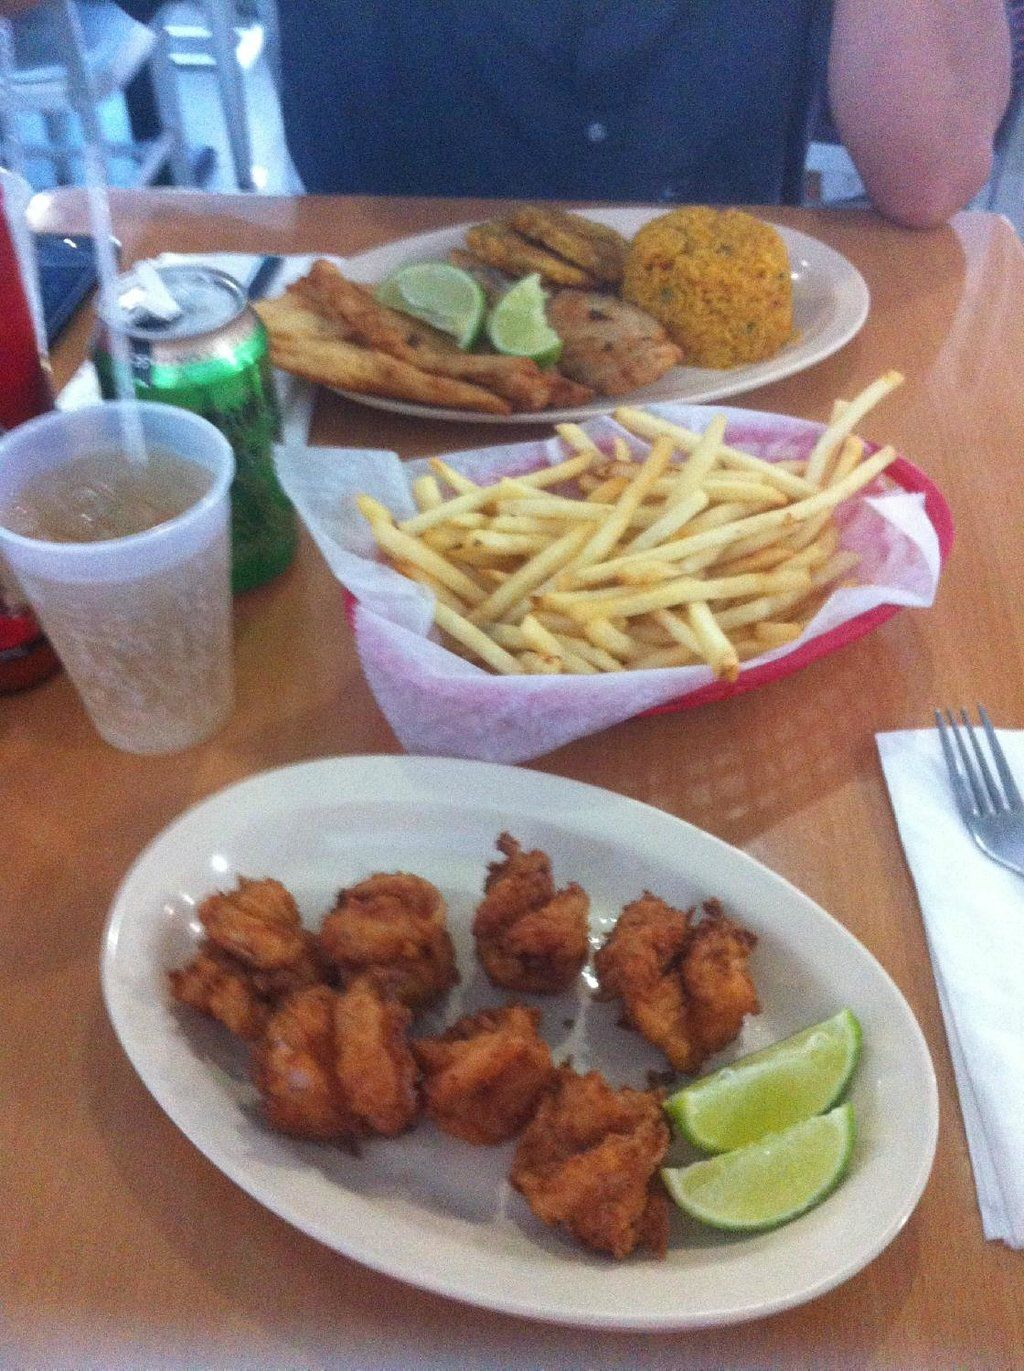 La Camaronera Fish Market, Miami: See 181 unbiased reviews of La ...